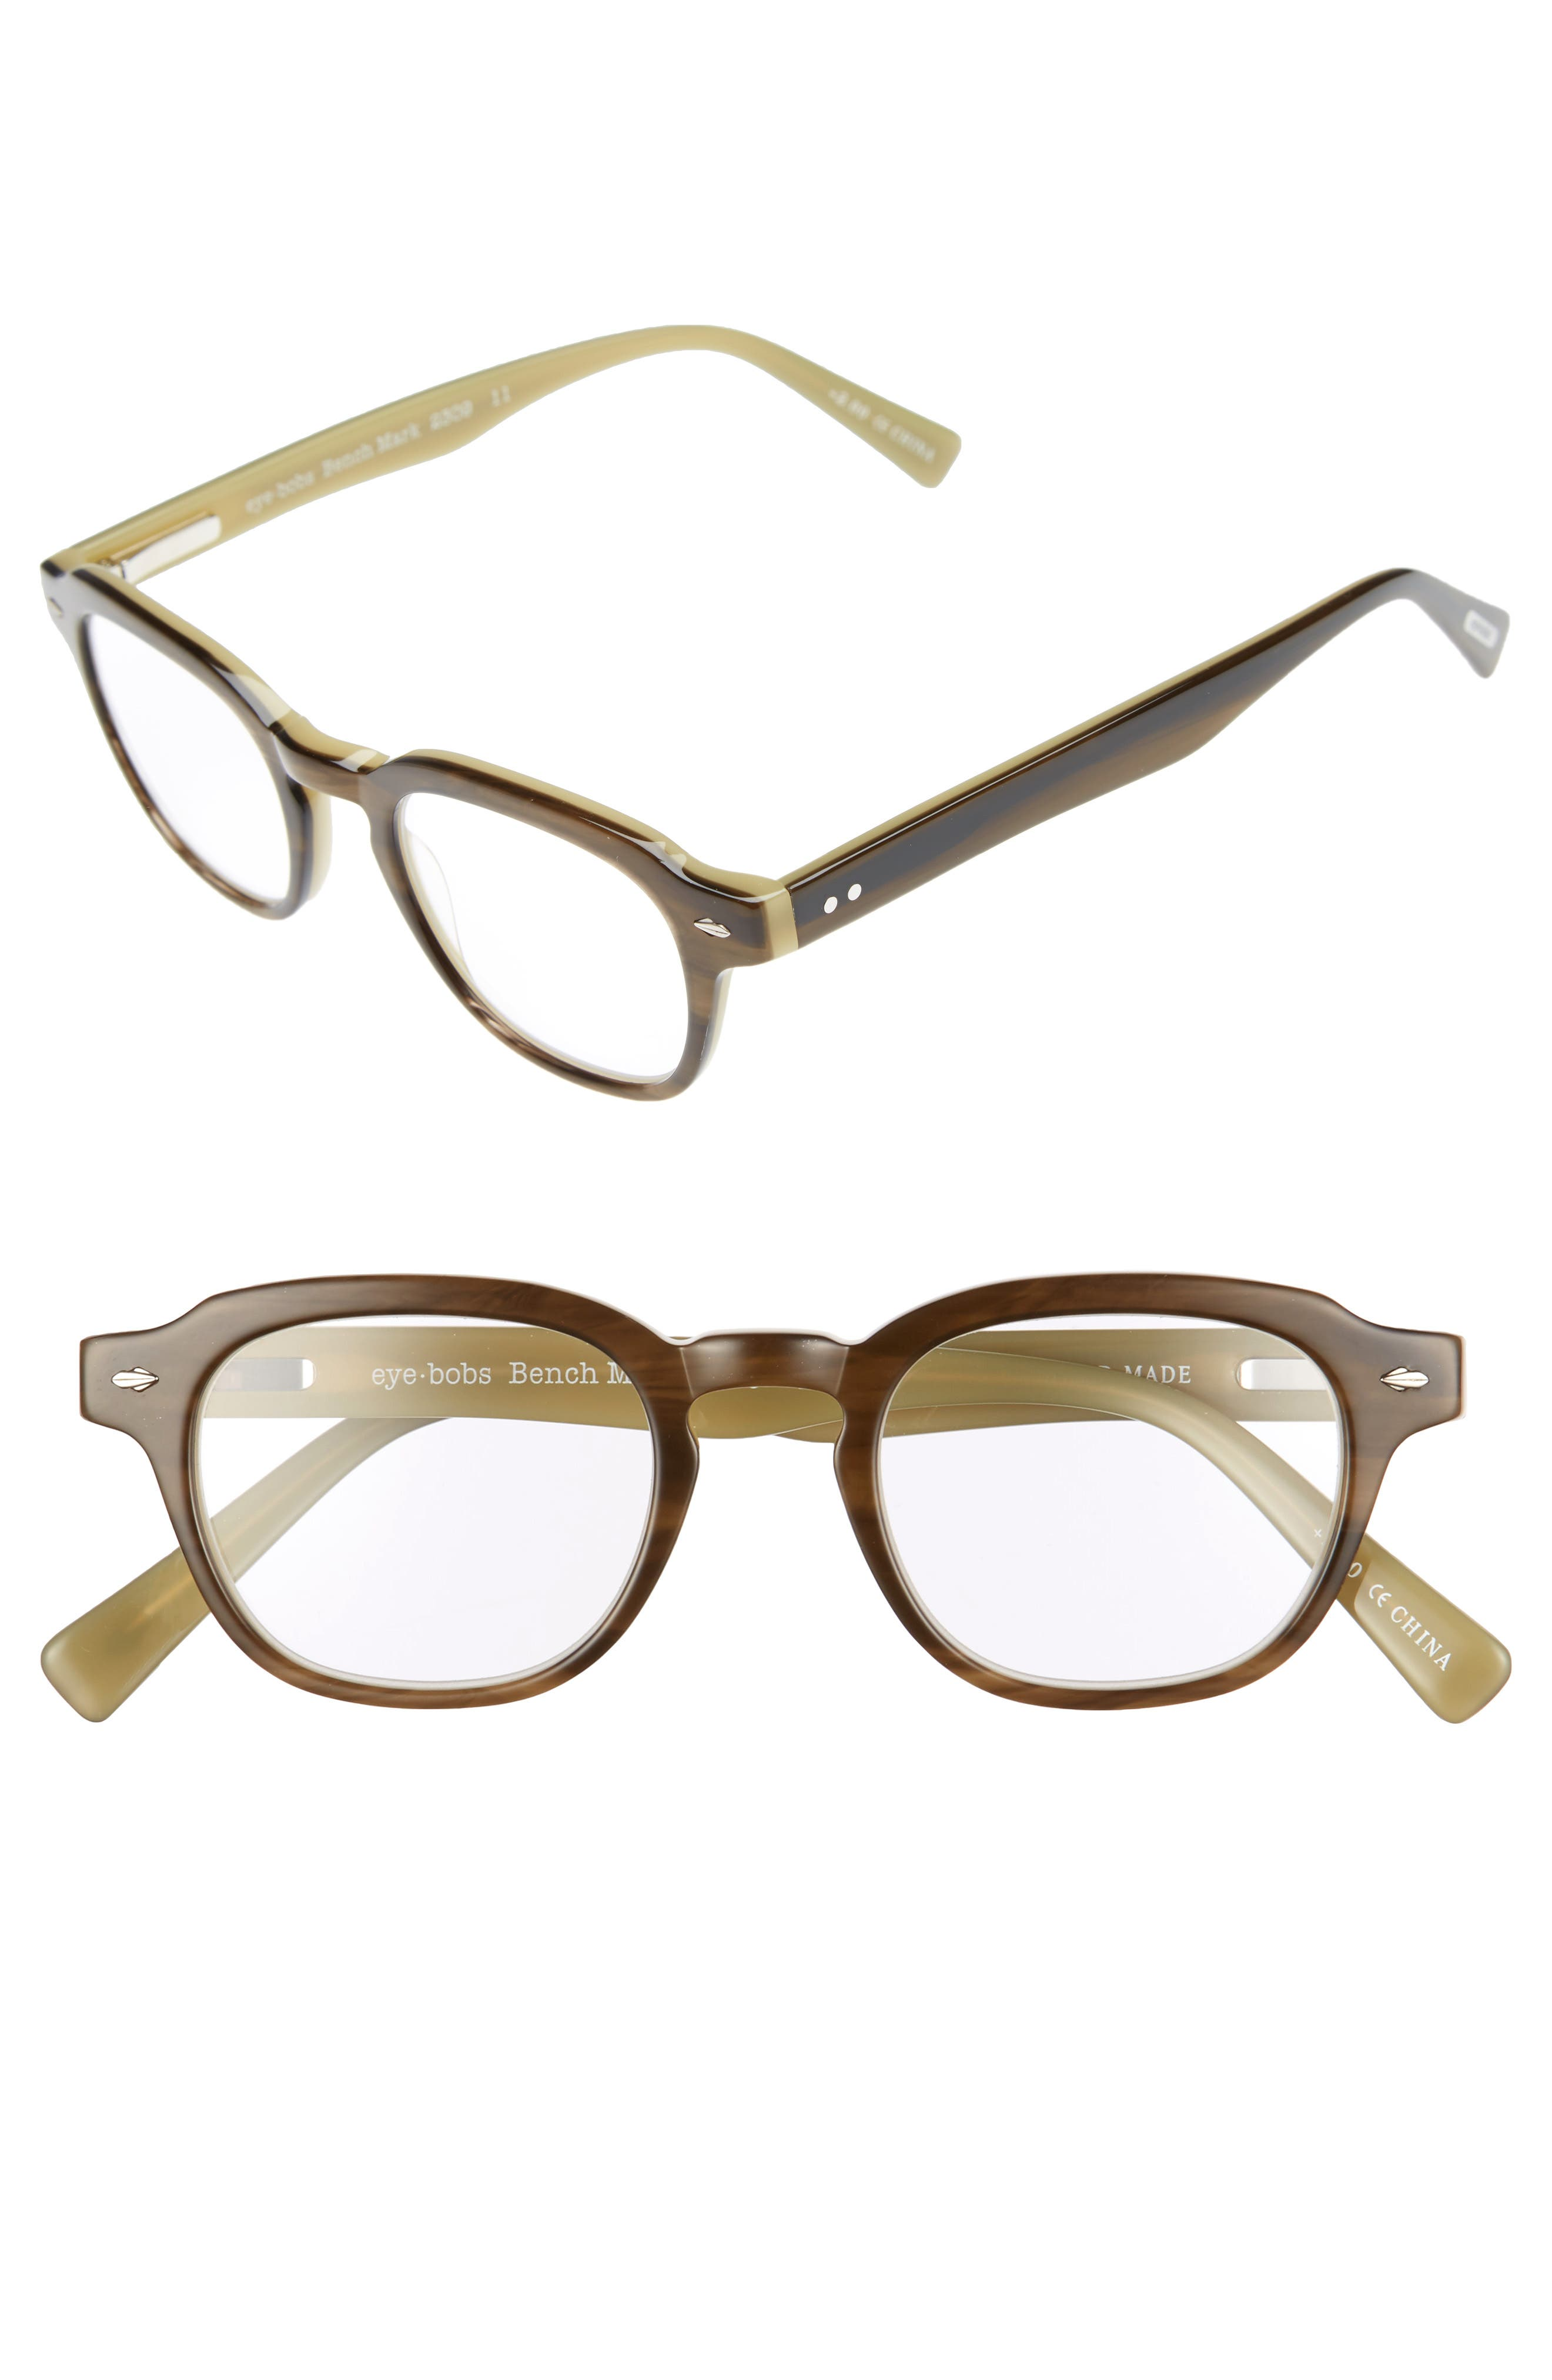 Bench Mark 46mm Reading Glasses,                         Main,                         color, KHAKI GREEN